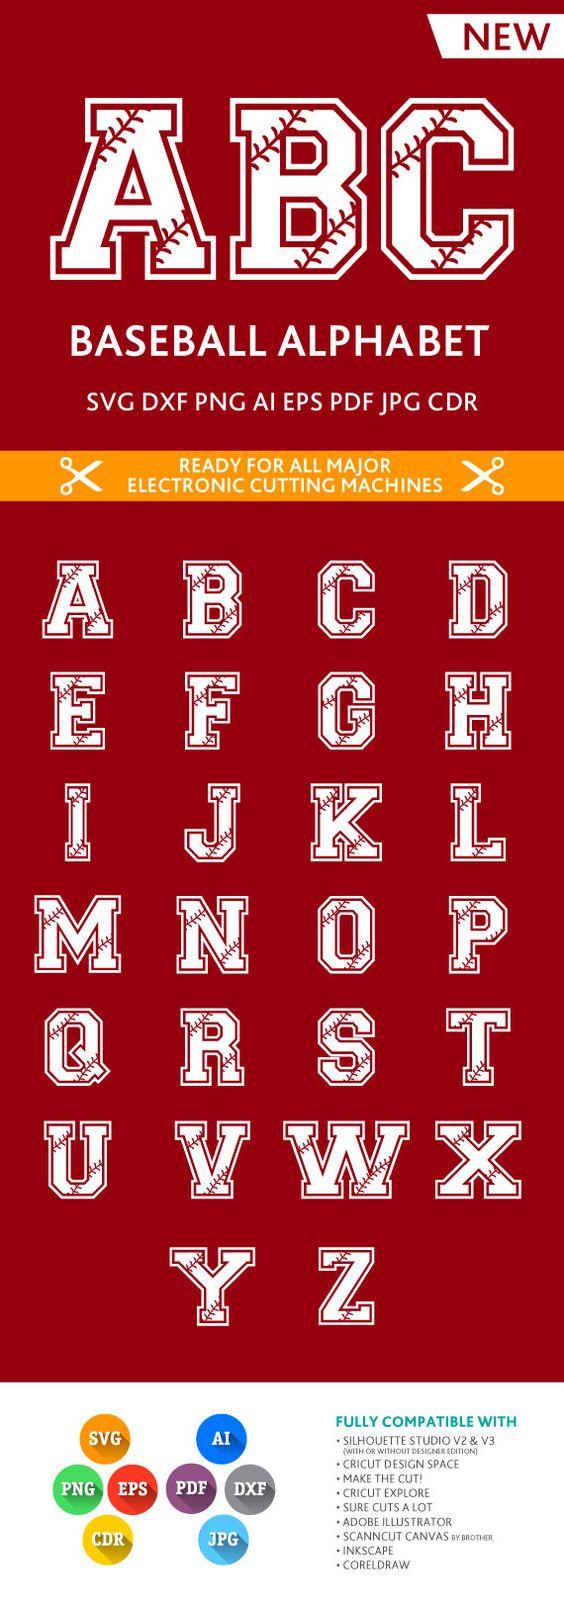 Softball / Baseball Letters SVG Stitches Alphabet Cut Files SVG DXF Eps Silhouette Studio Png Pdf Jpg Ai Cdr Silhouette Studio Cricut Cameo